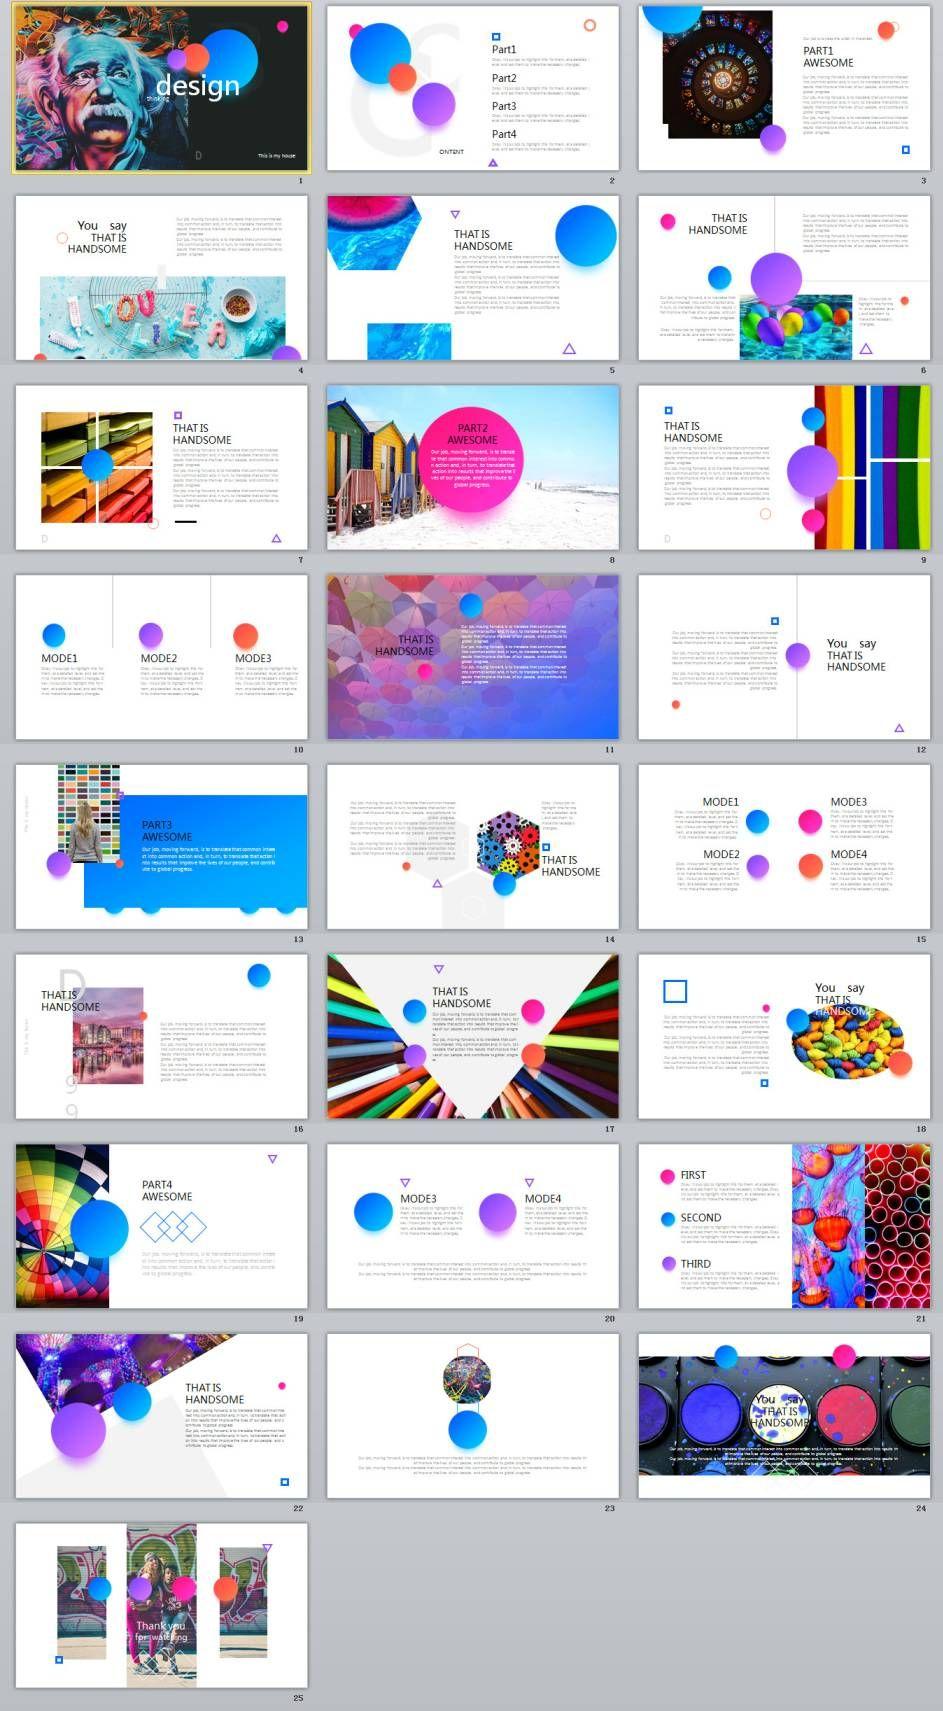 25 spherical color creative design powerpoint templates creative 25 spherical color creative design powerpoint templates toneelgroepblik Image collections